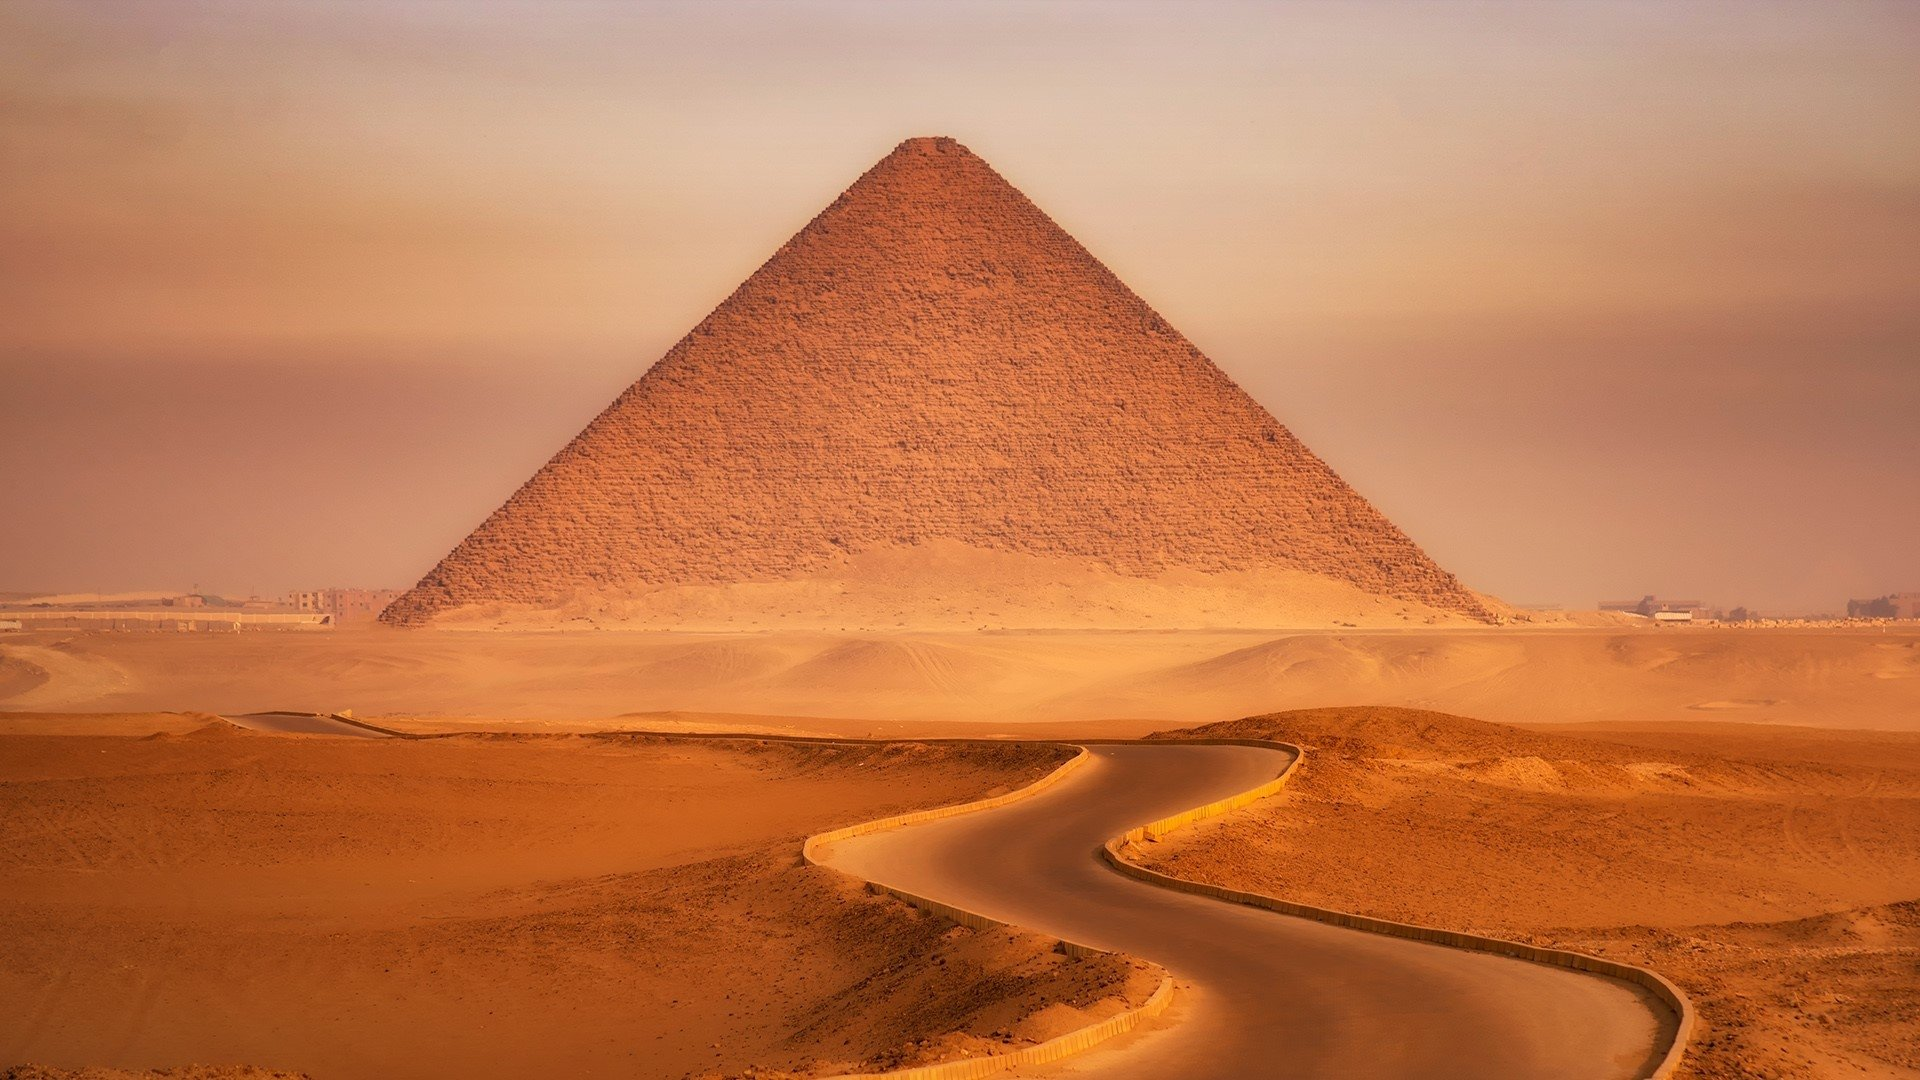 Pyramide Fond D Ecran Hd Arriere Plan 1920x1080 Id 1080641 Wallpaper Abyss